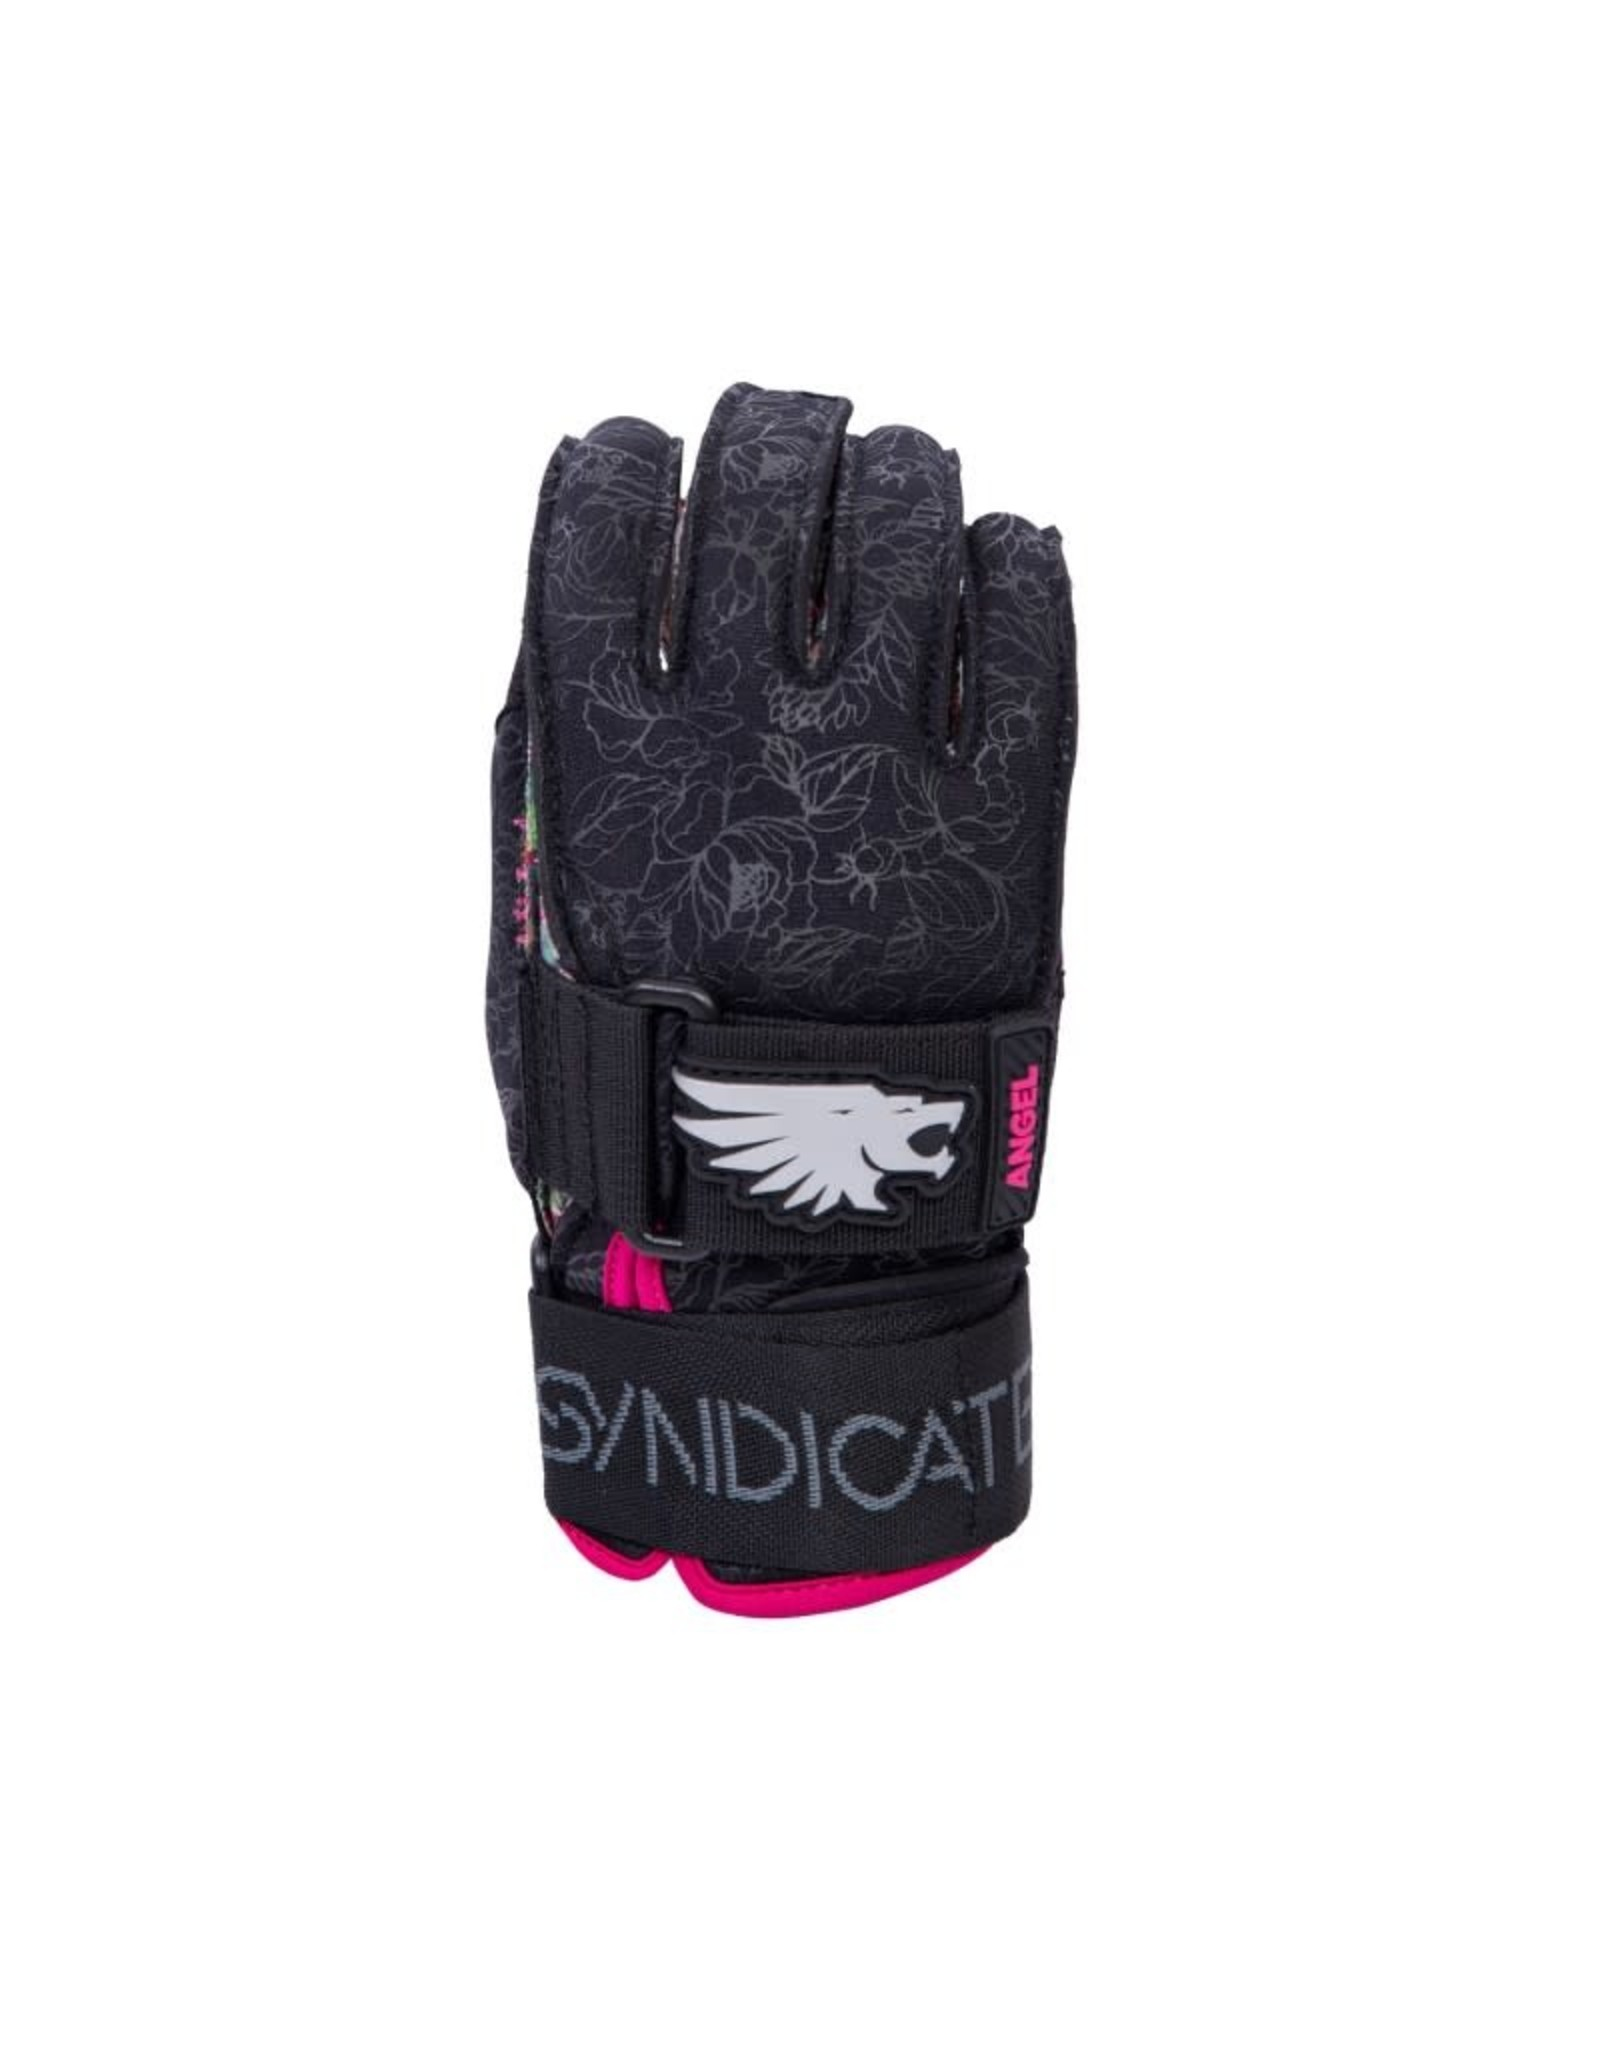 HO/Hyperlite Syndicate Angel Inside Out Glove